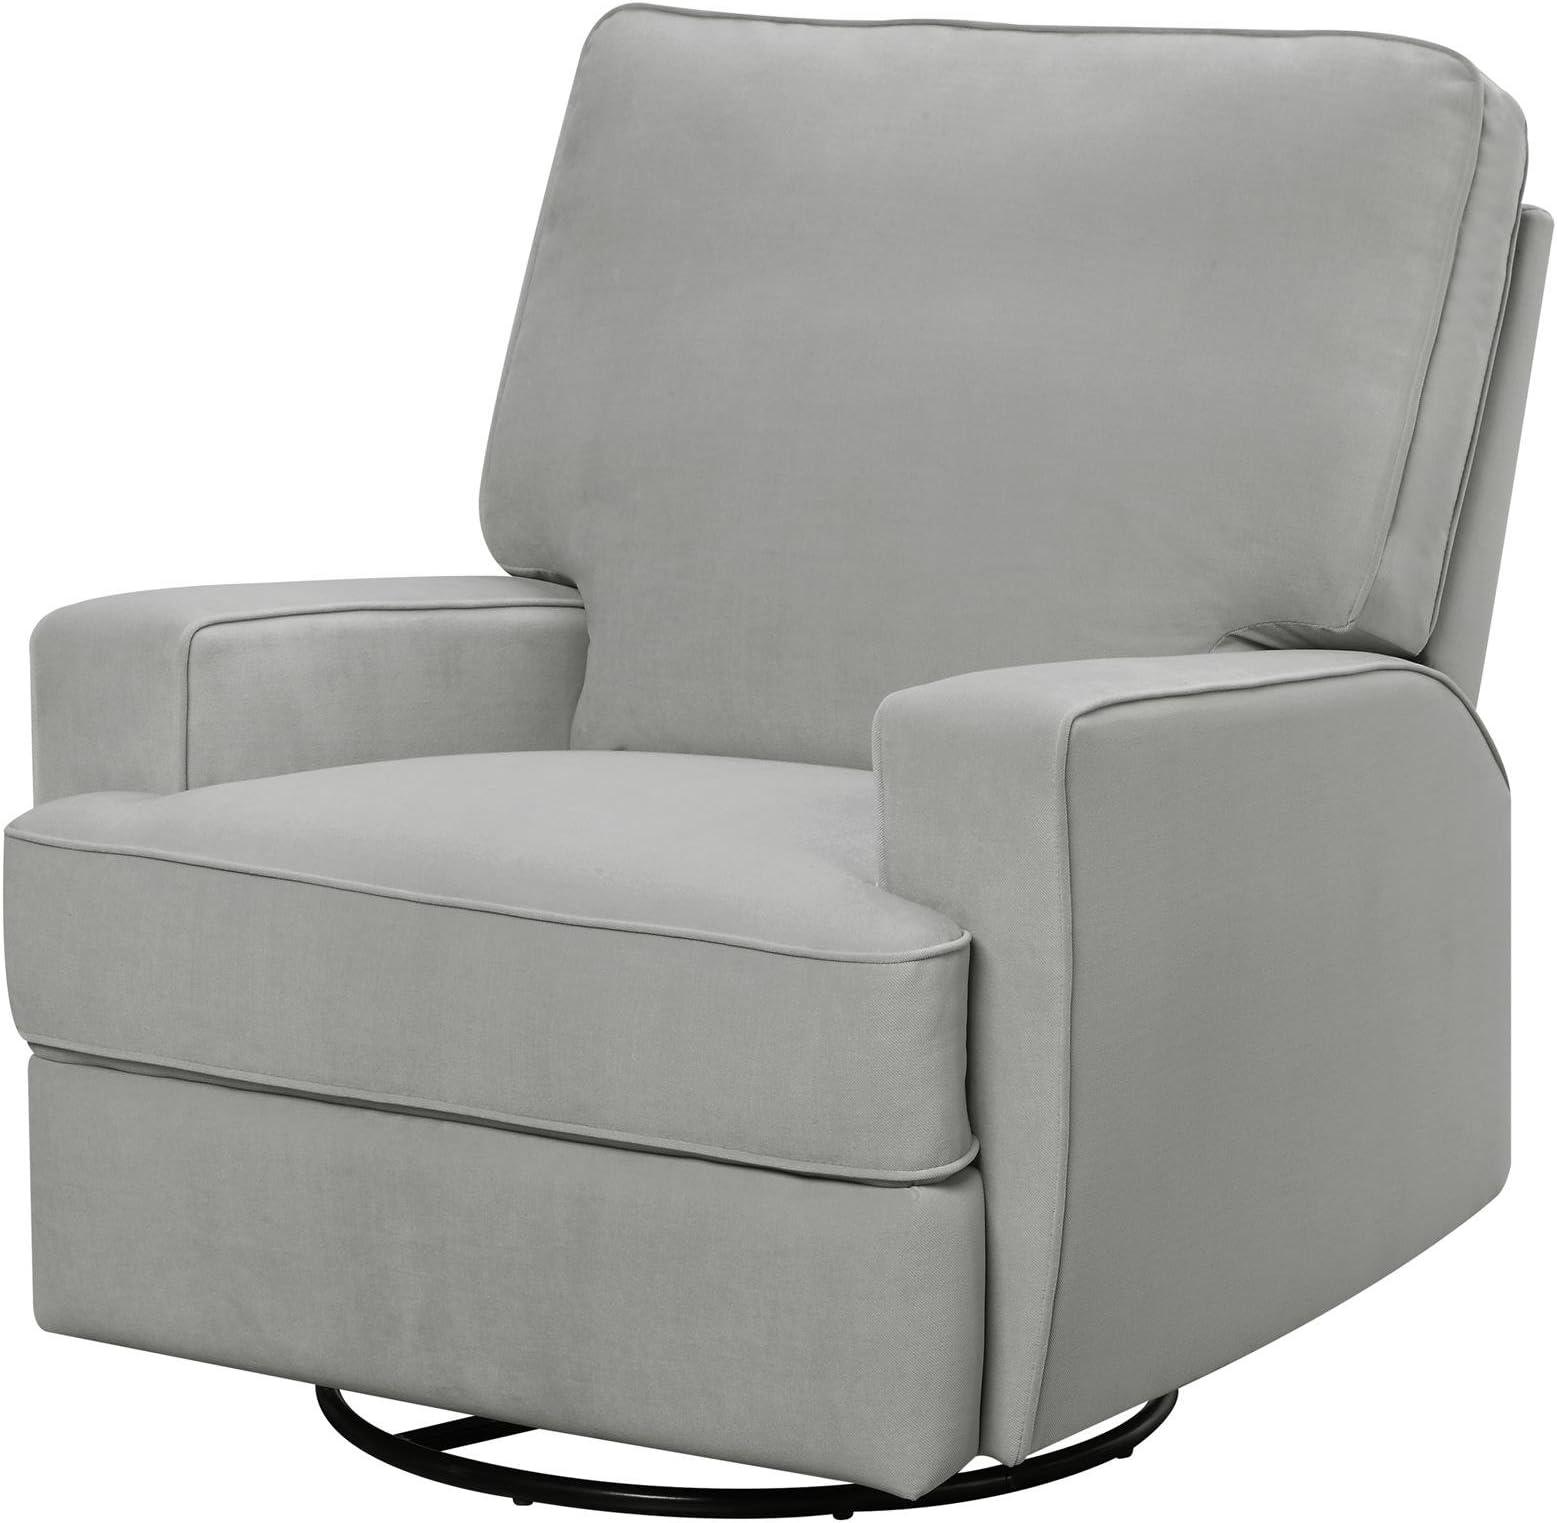 Baby Relax Rylan Swivel Gliding Recliner Gray  sc 1 st  Amazon.com & Amazon.com: Gliders Ottomans u0026 Rocking Chairs: Baby Products ... islam-shia.org